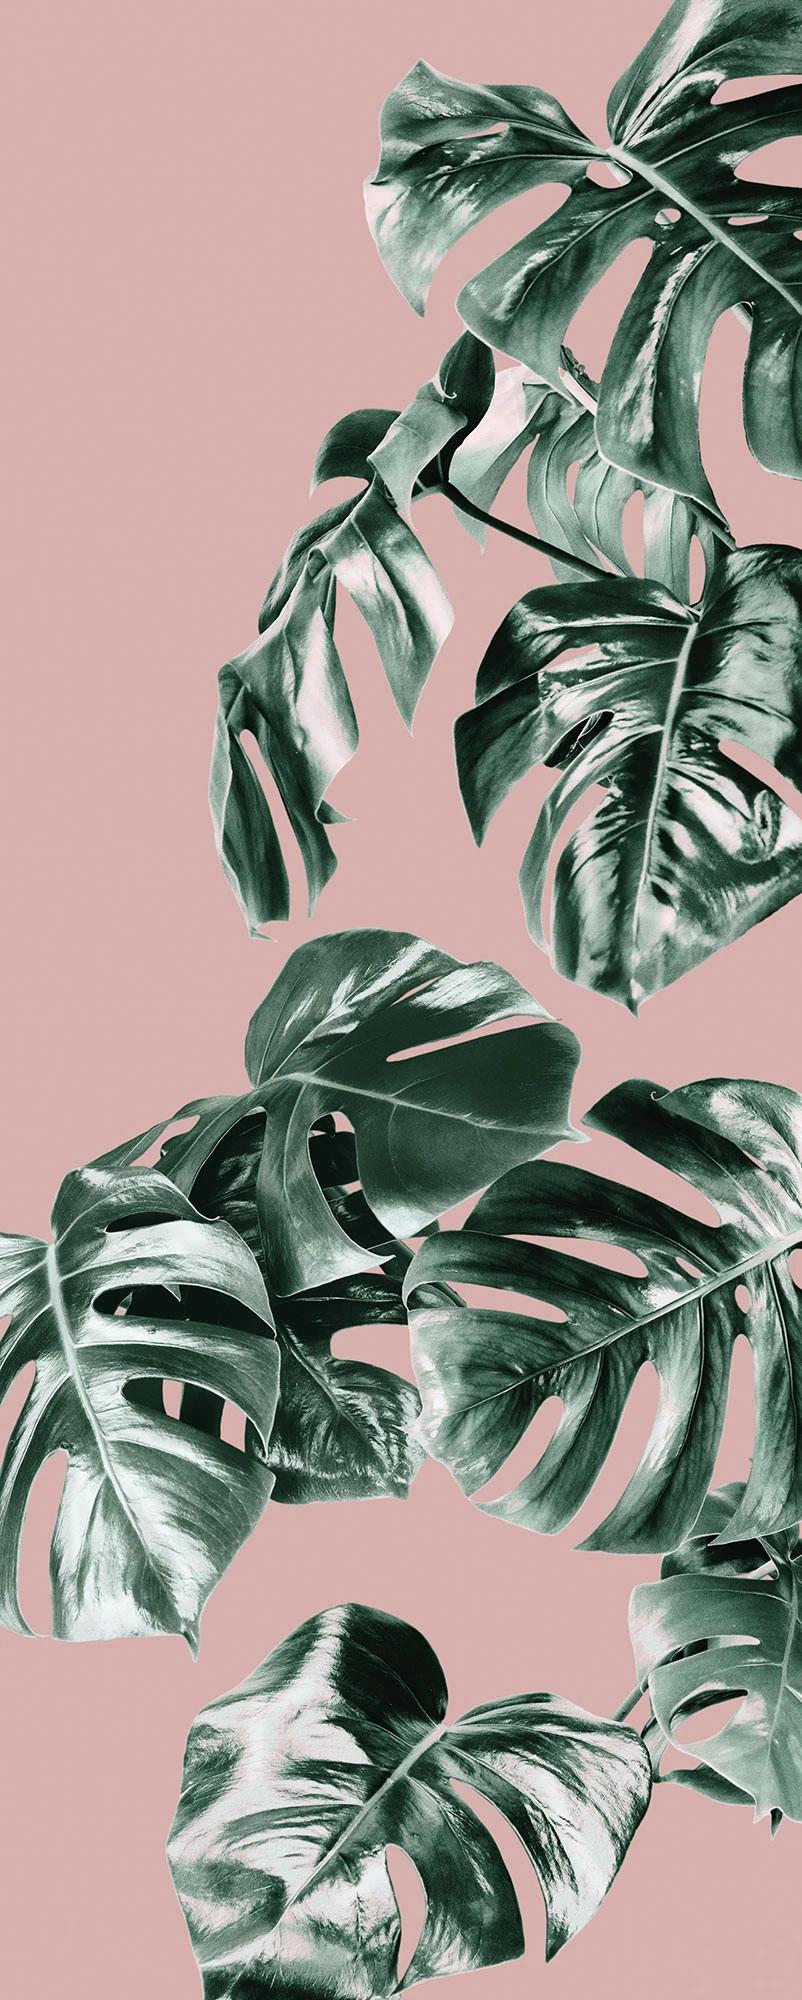 42+ Plant wallpaper iphone laptop